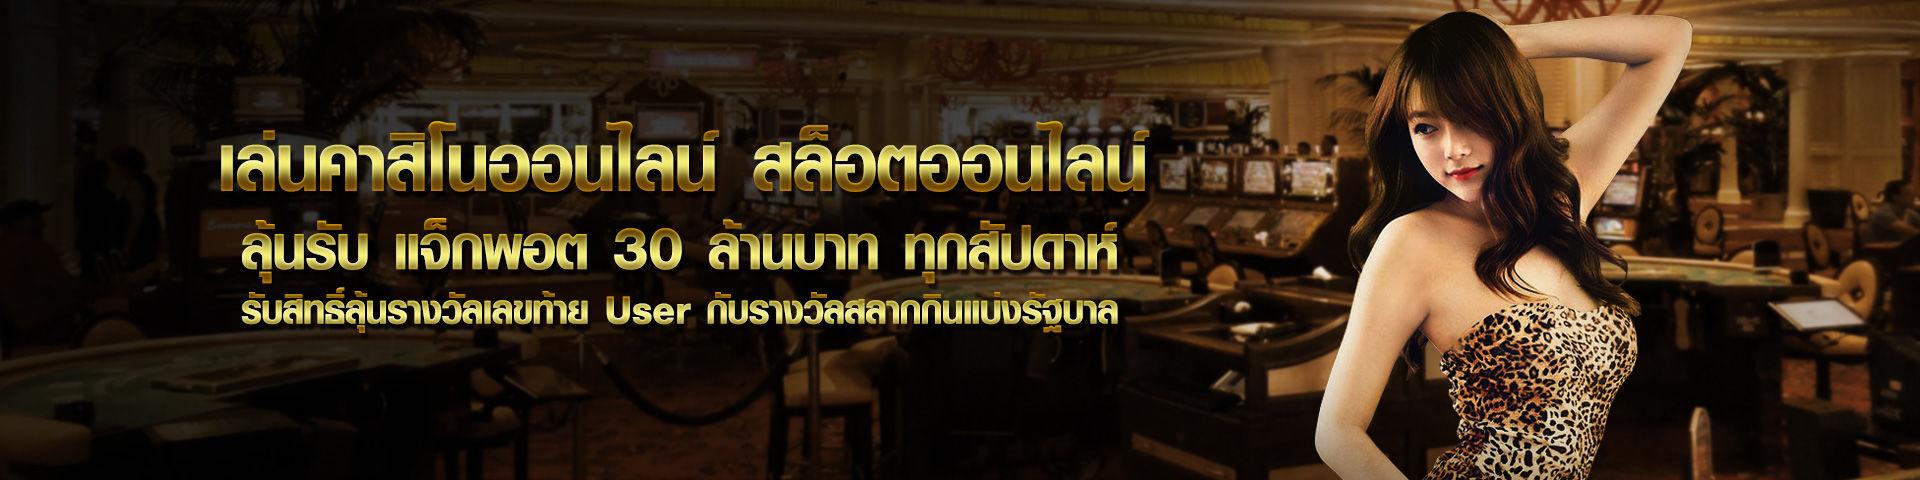 artical-live-casinoonline.jpg